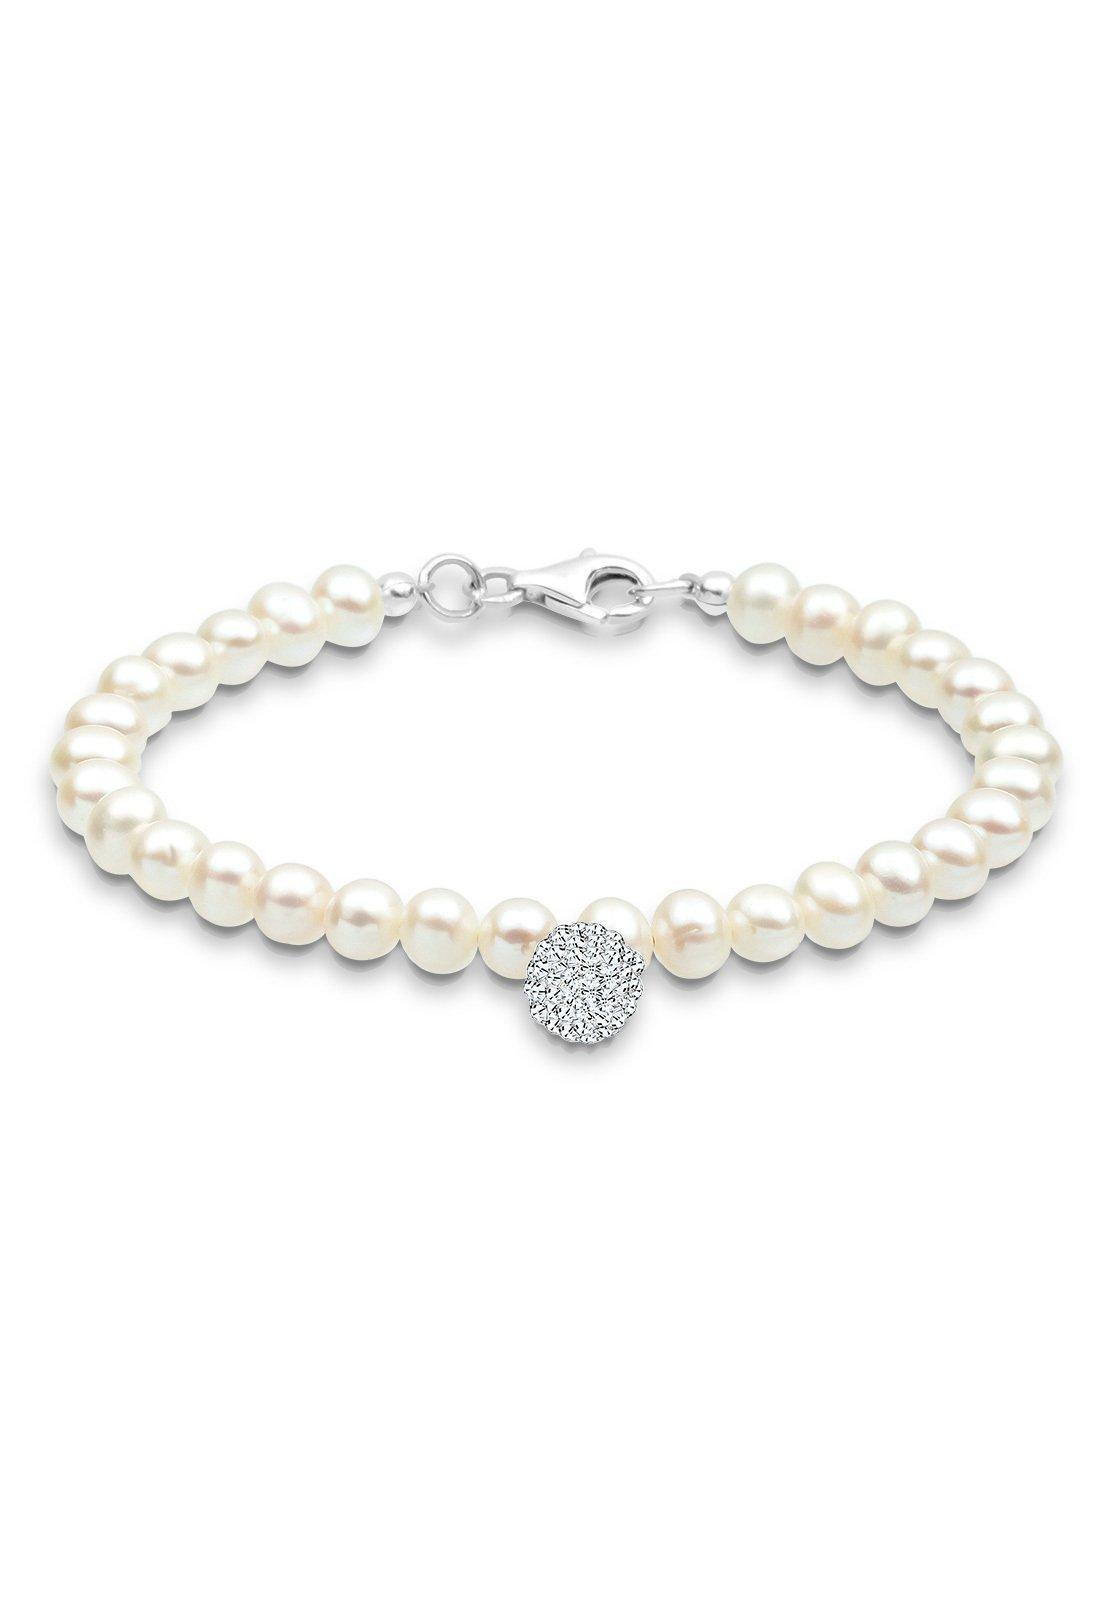 PERLU Perlenarmband Perle Schneeflocke Swarovski Kristalle 925 Silber